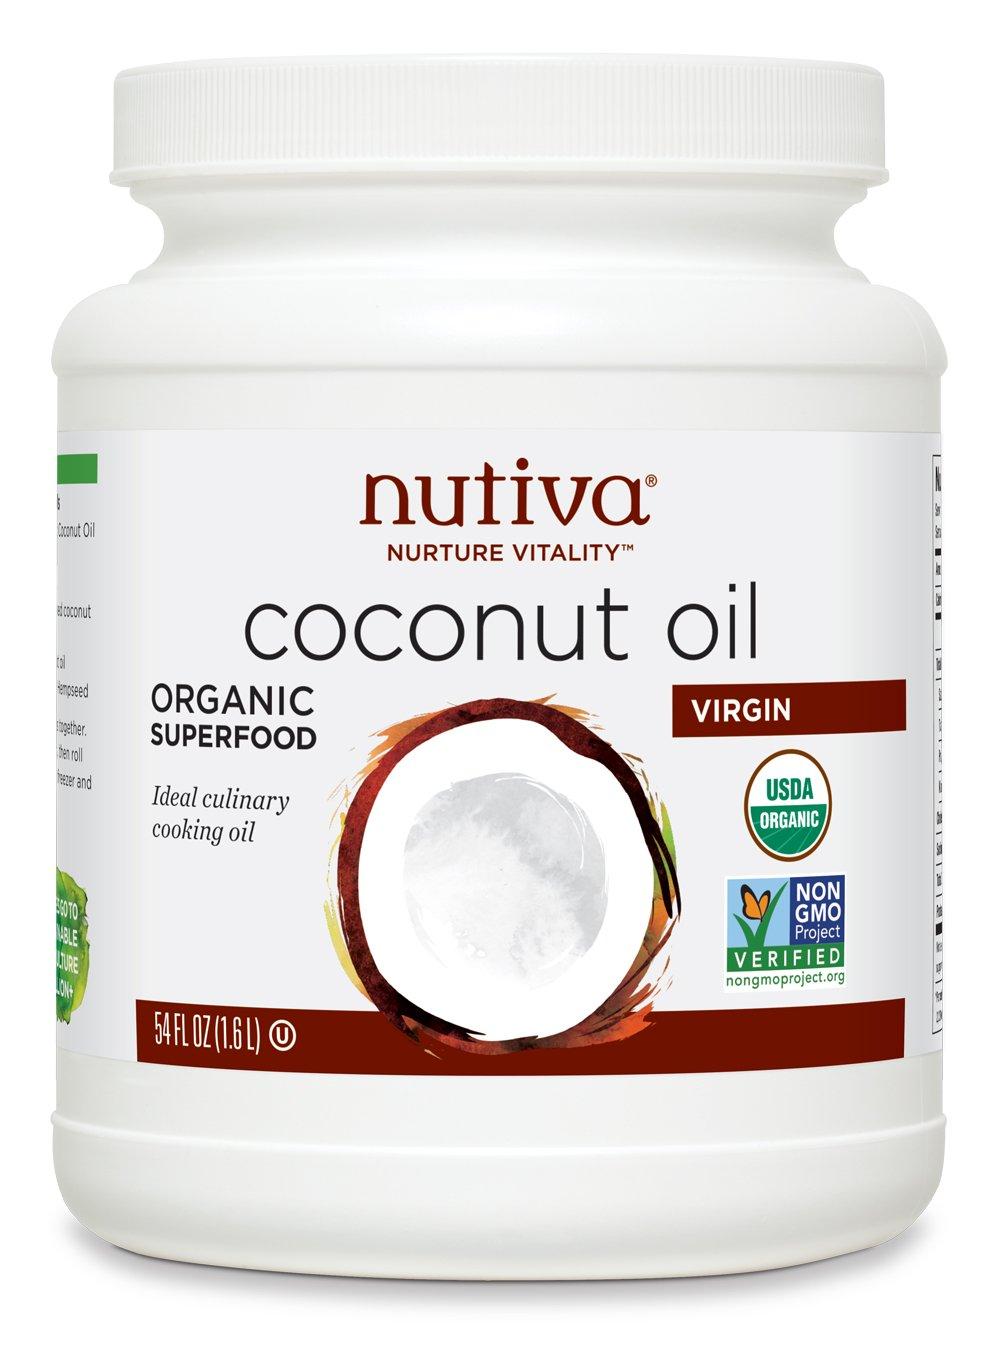 Nutiva Organic, Cold-Pressed, Unrefined, Virgin Coconut Oil from Fresh, non-GMO, Sustainably Farmed Coconuts, 54 Fluid Ounces